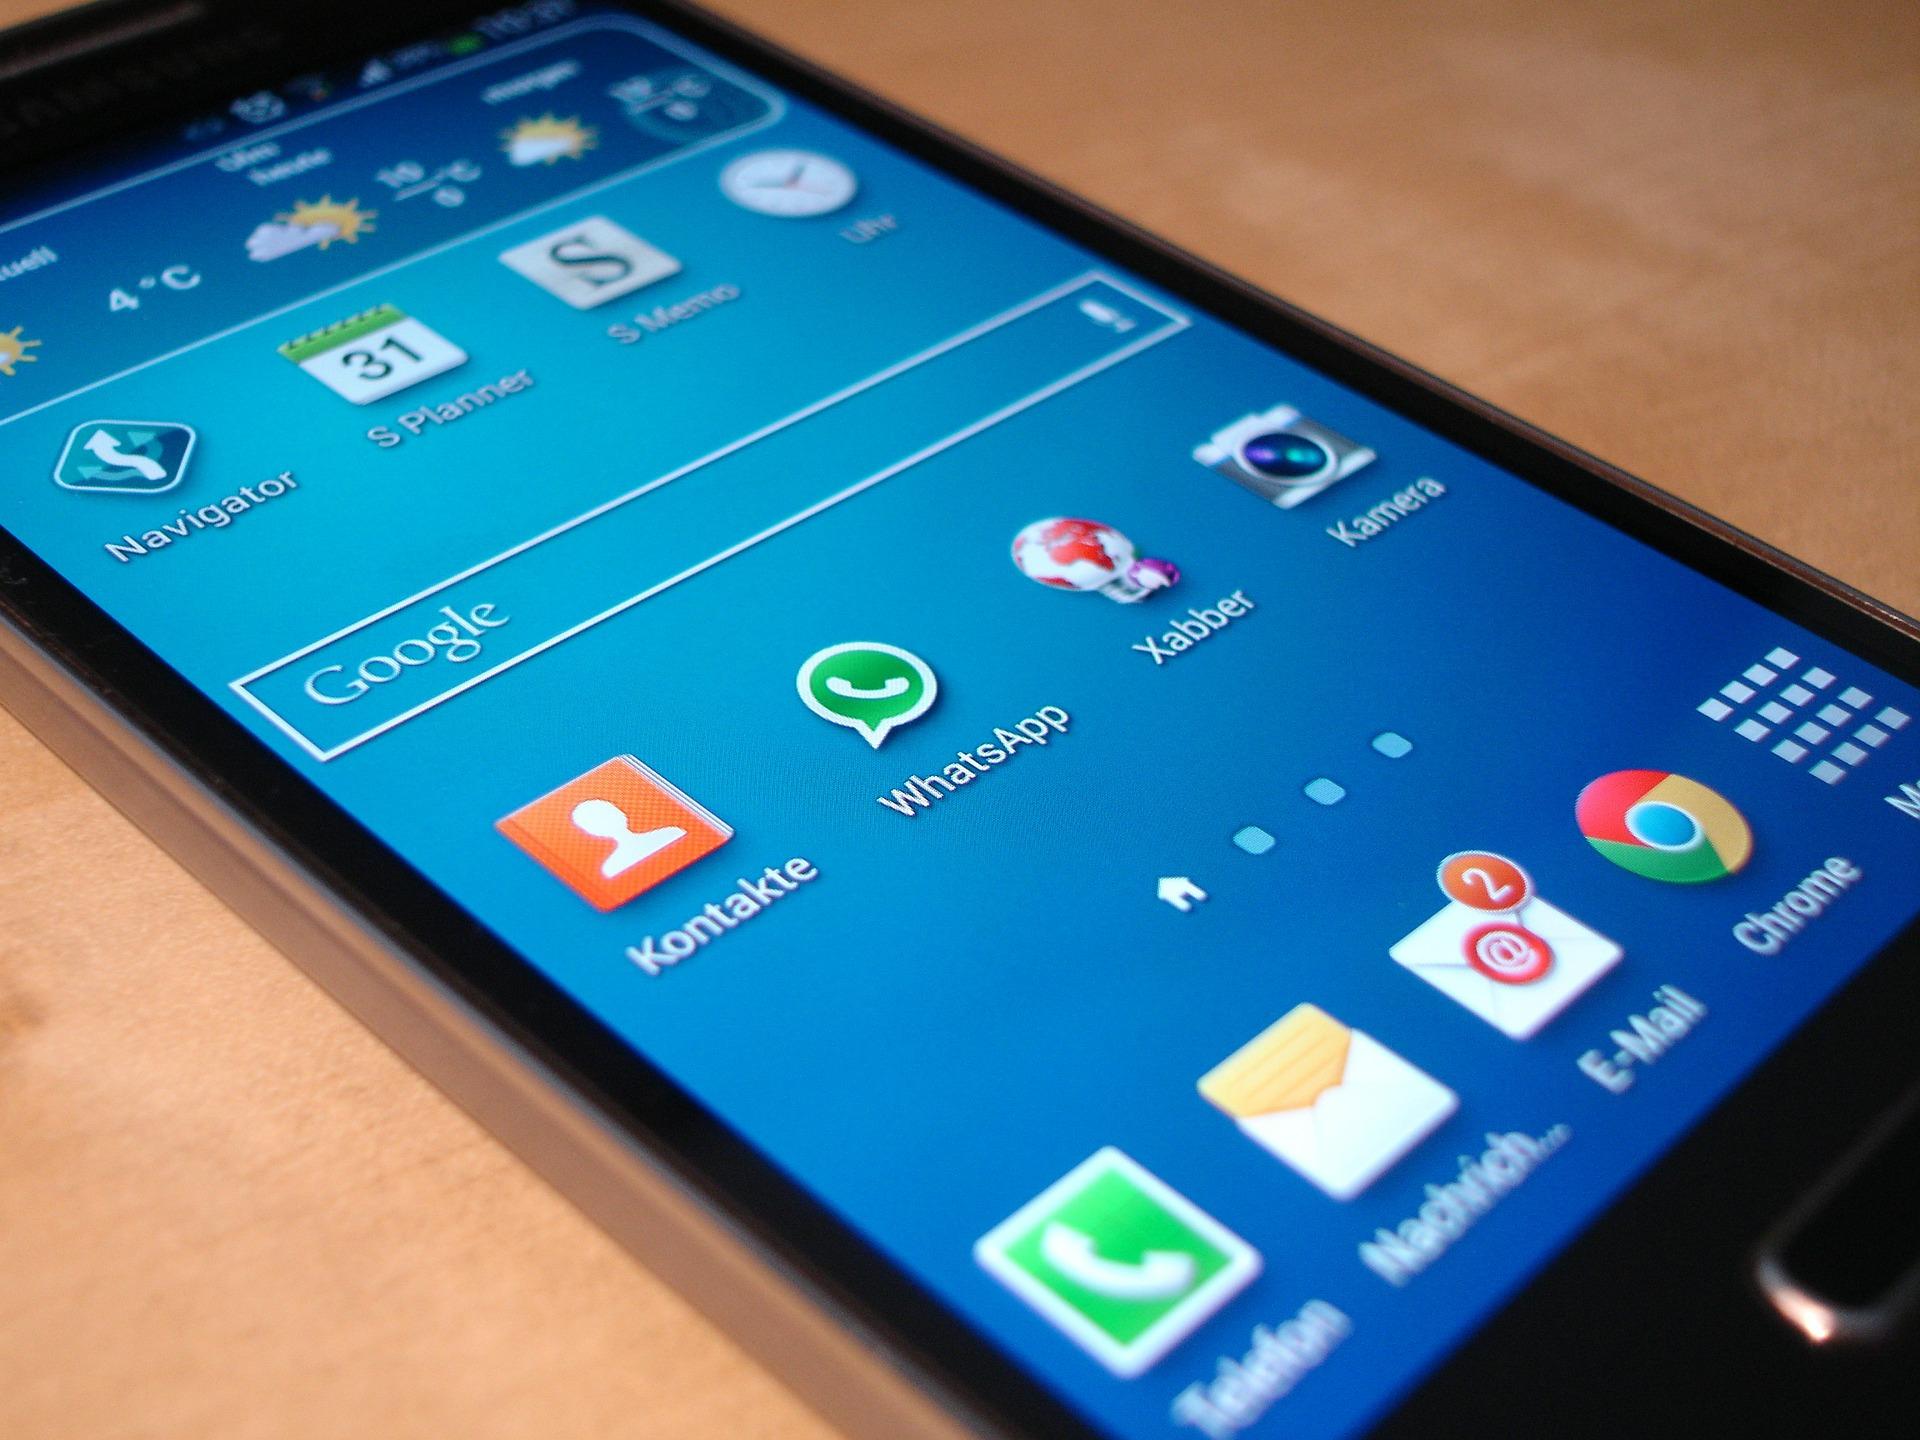 Samsung agrega soporte para carteras de hardware en dispositivos Galaxy